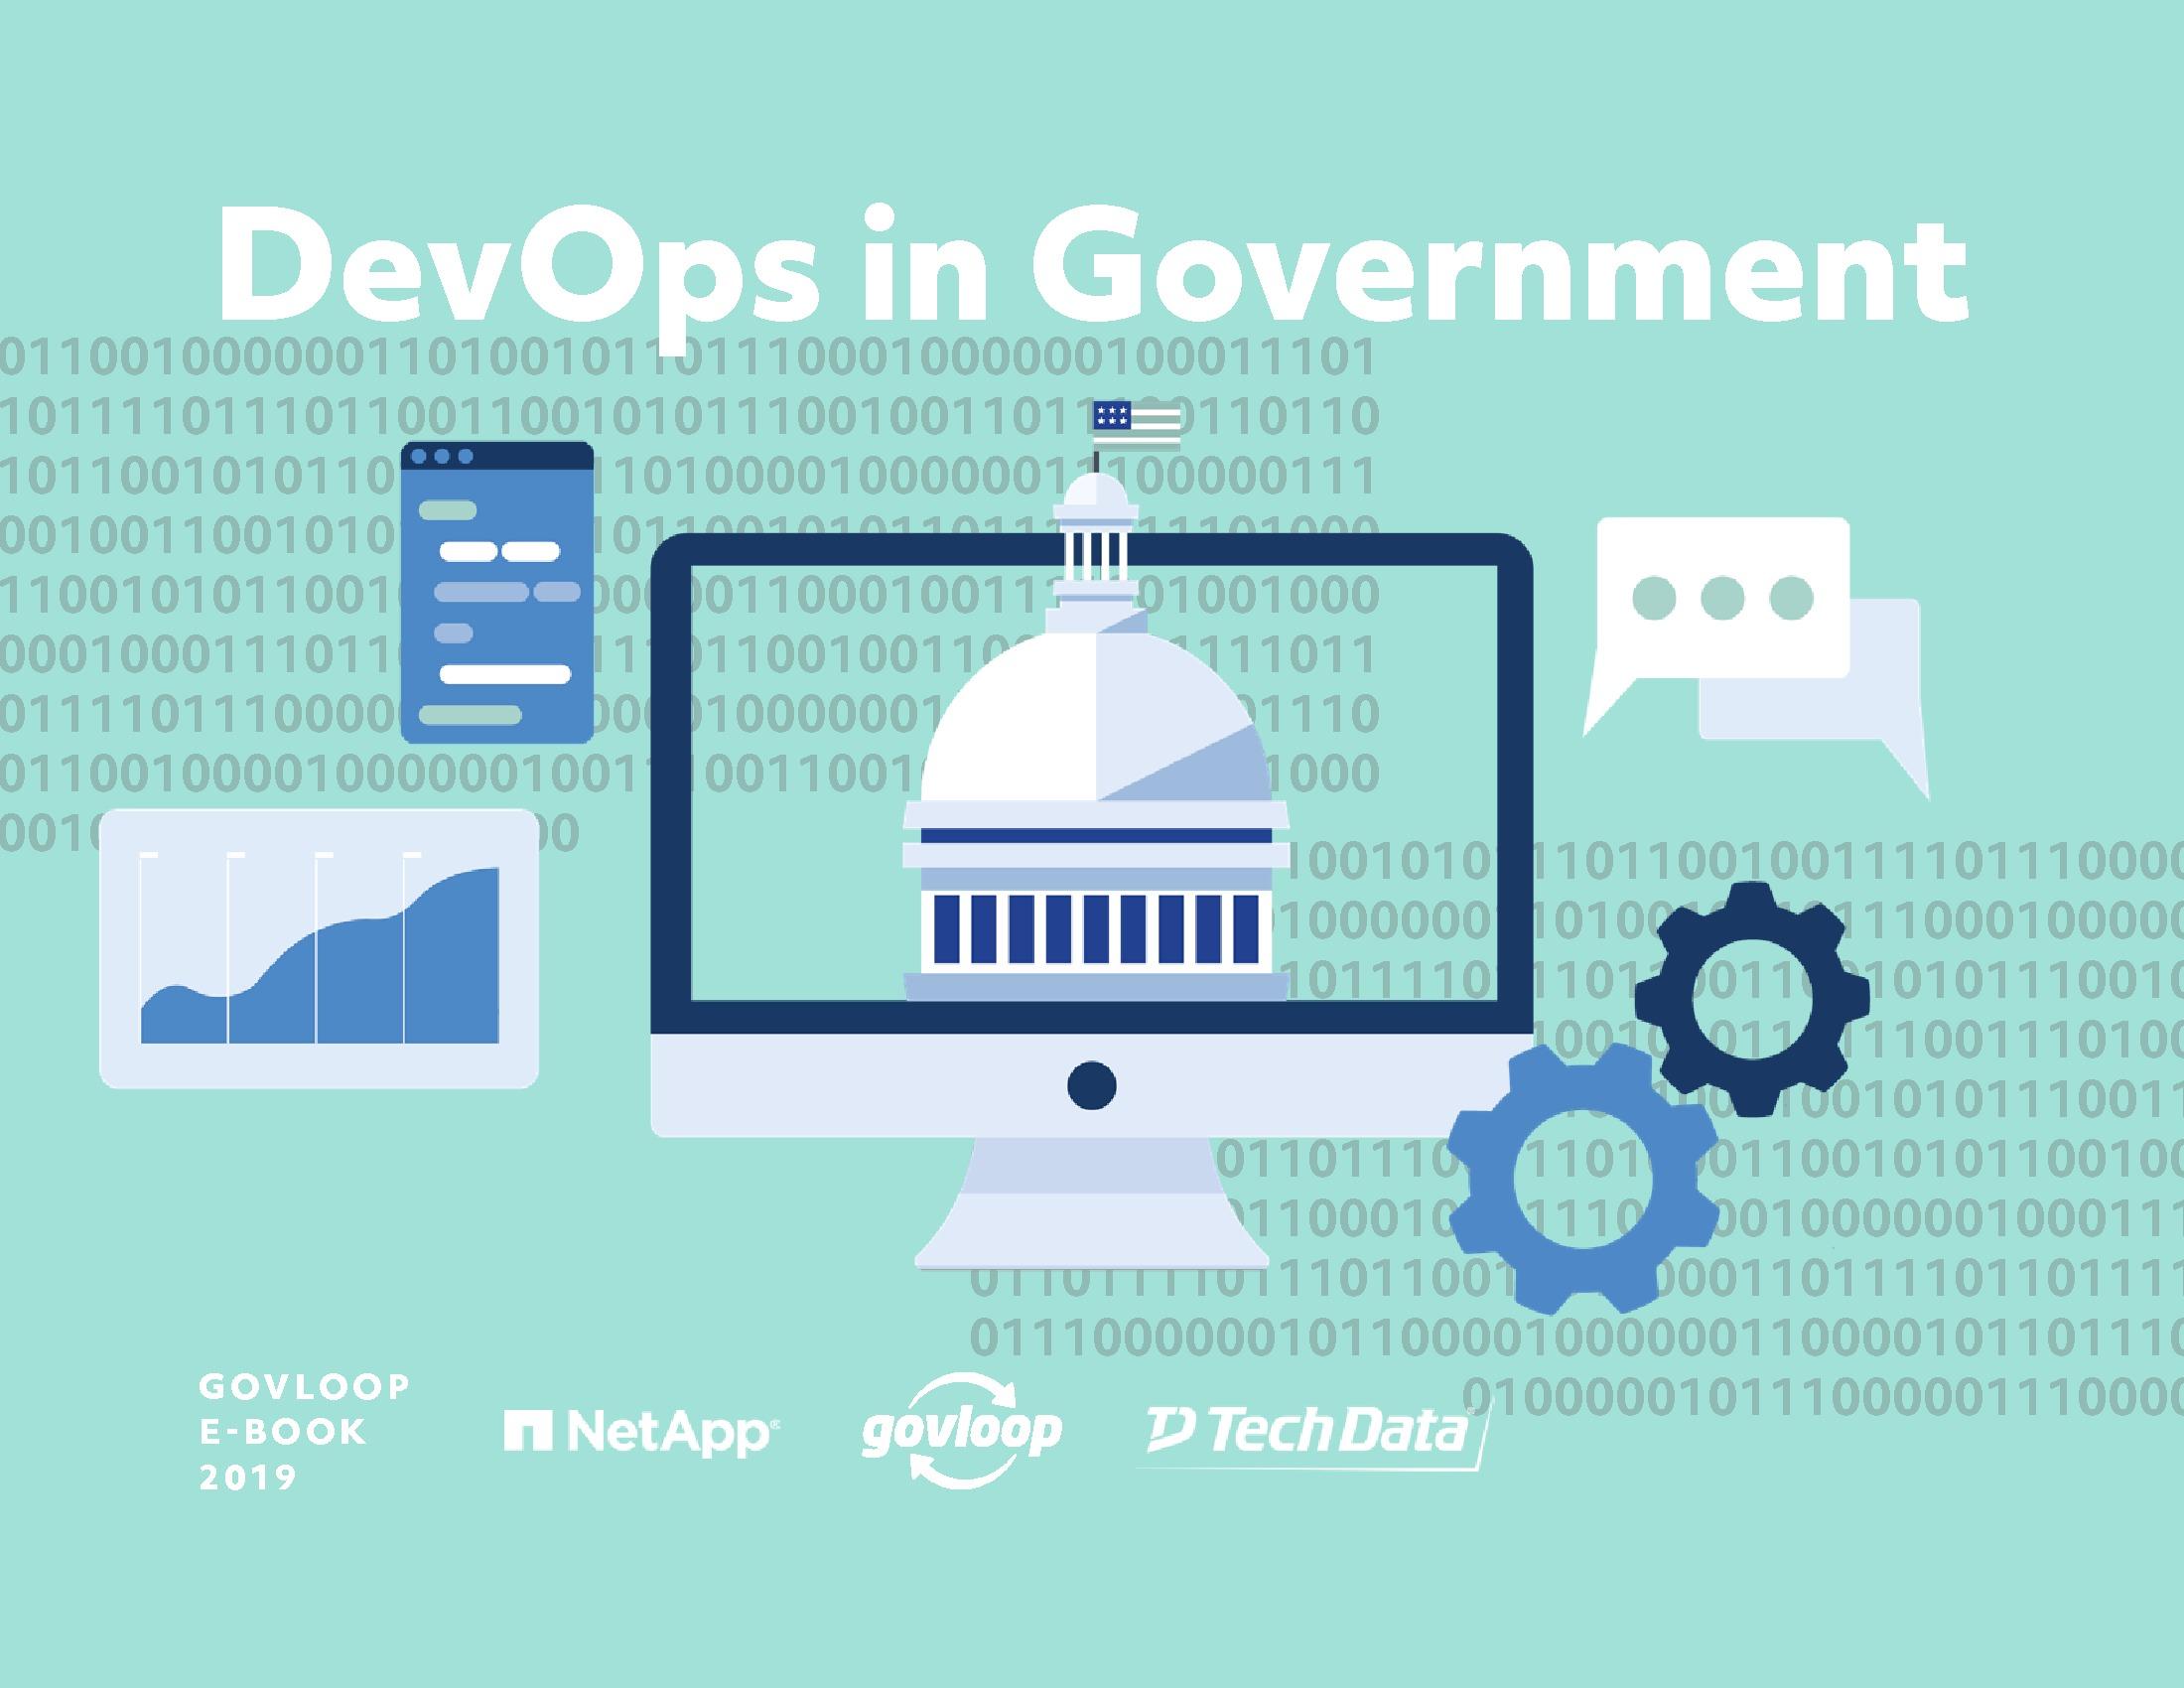 GT - NetApp - Client Supplied - 200109 - DevOps in Government